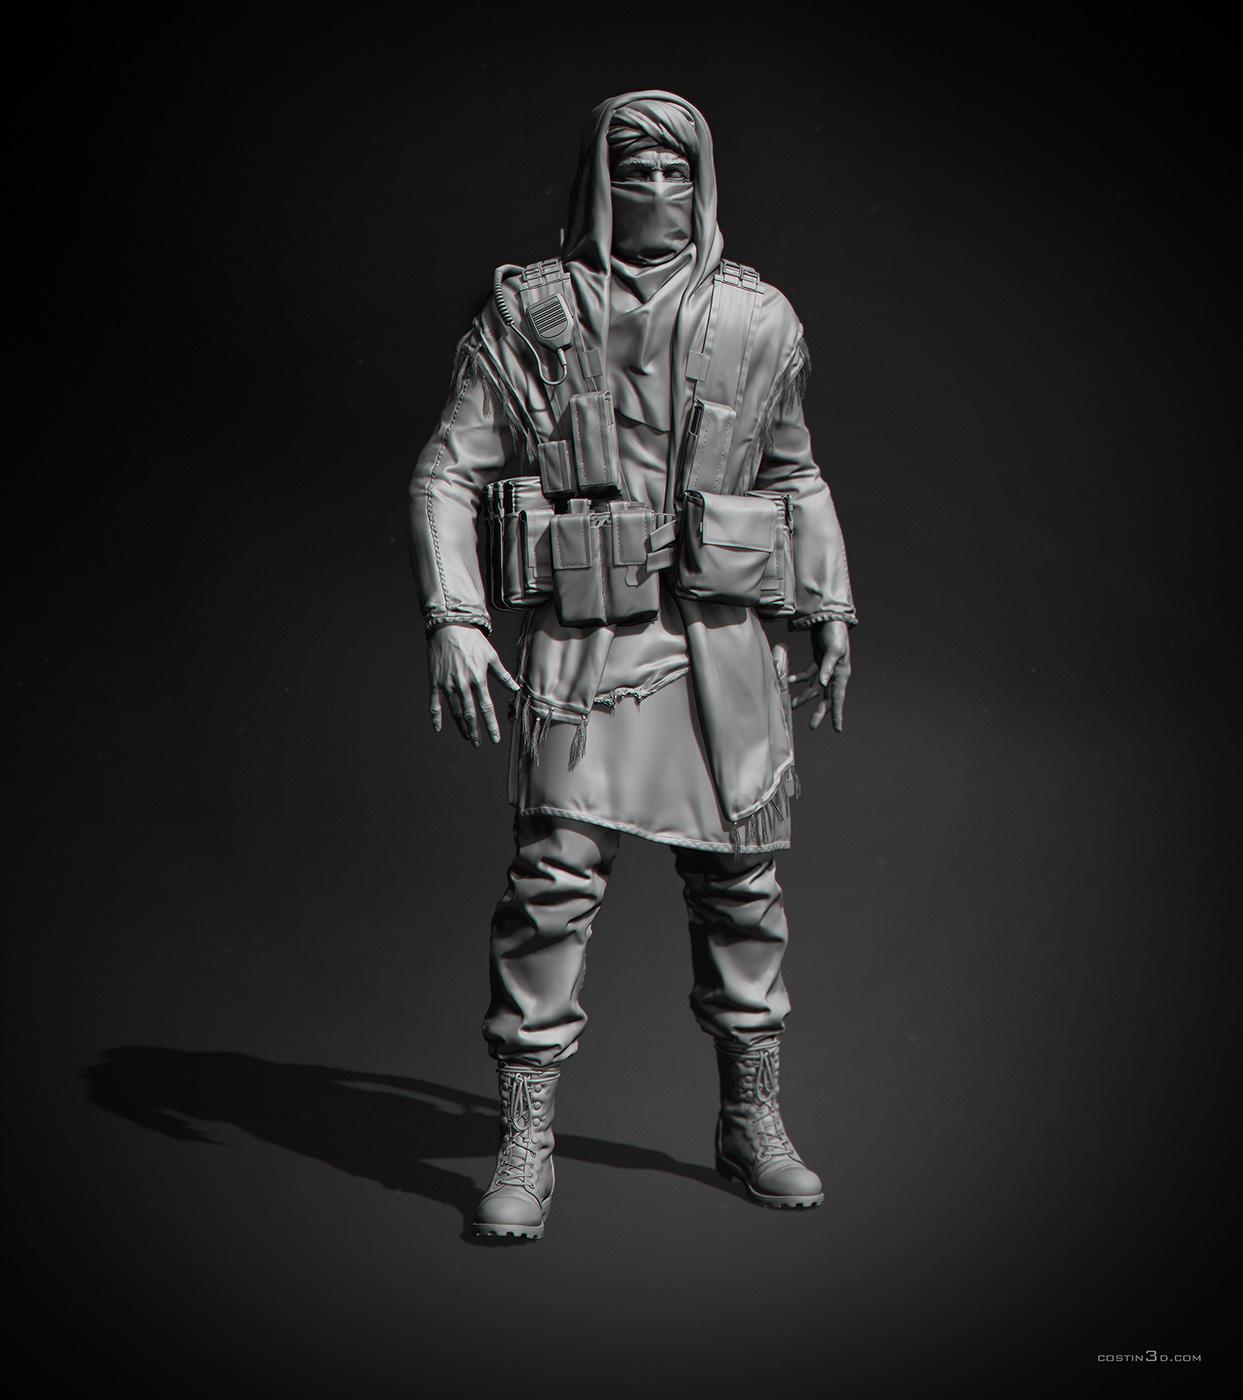 taliban_warrior_01.jpg